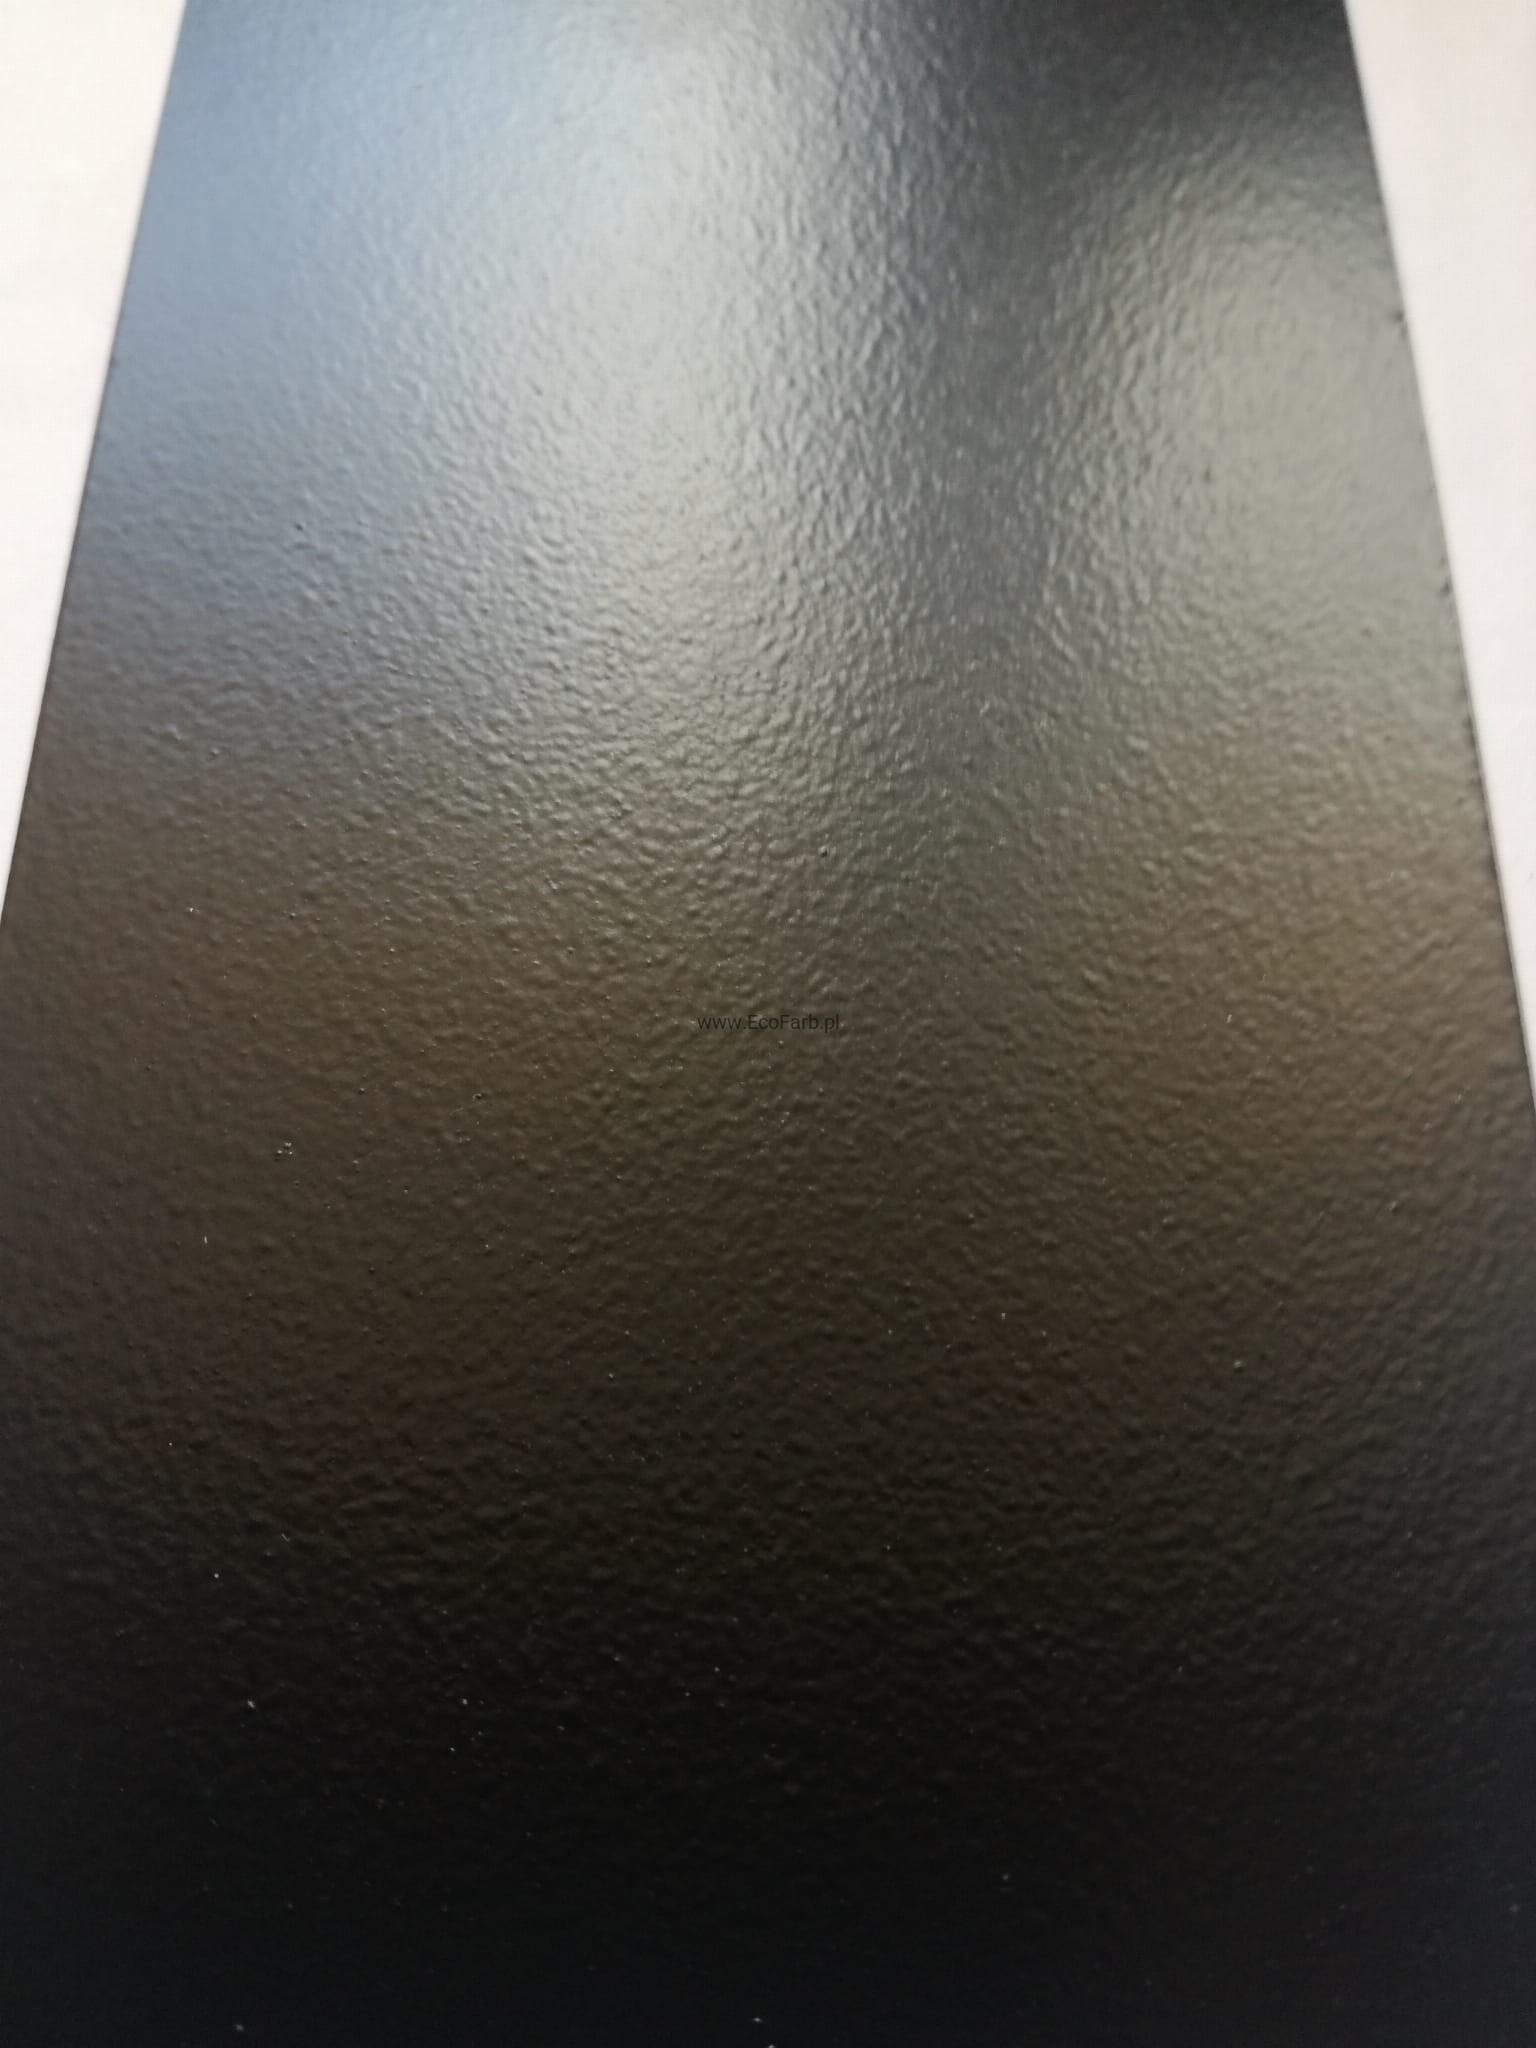 Farba Proszkowa Silikonowa Wysokotemperaturowa Odporna Do 550 C